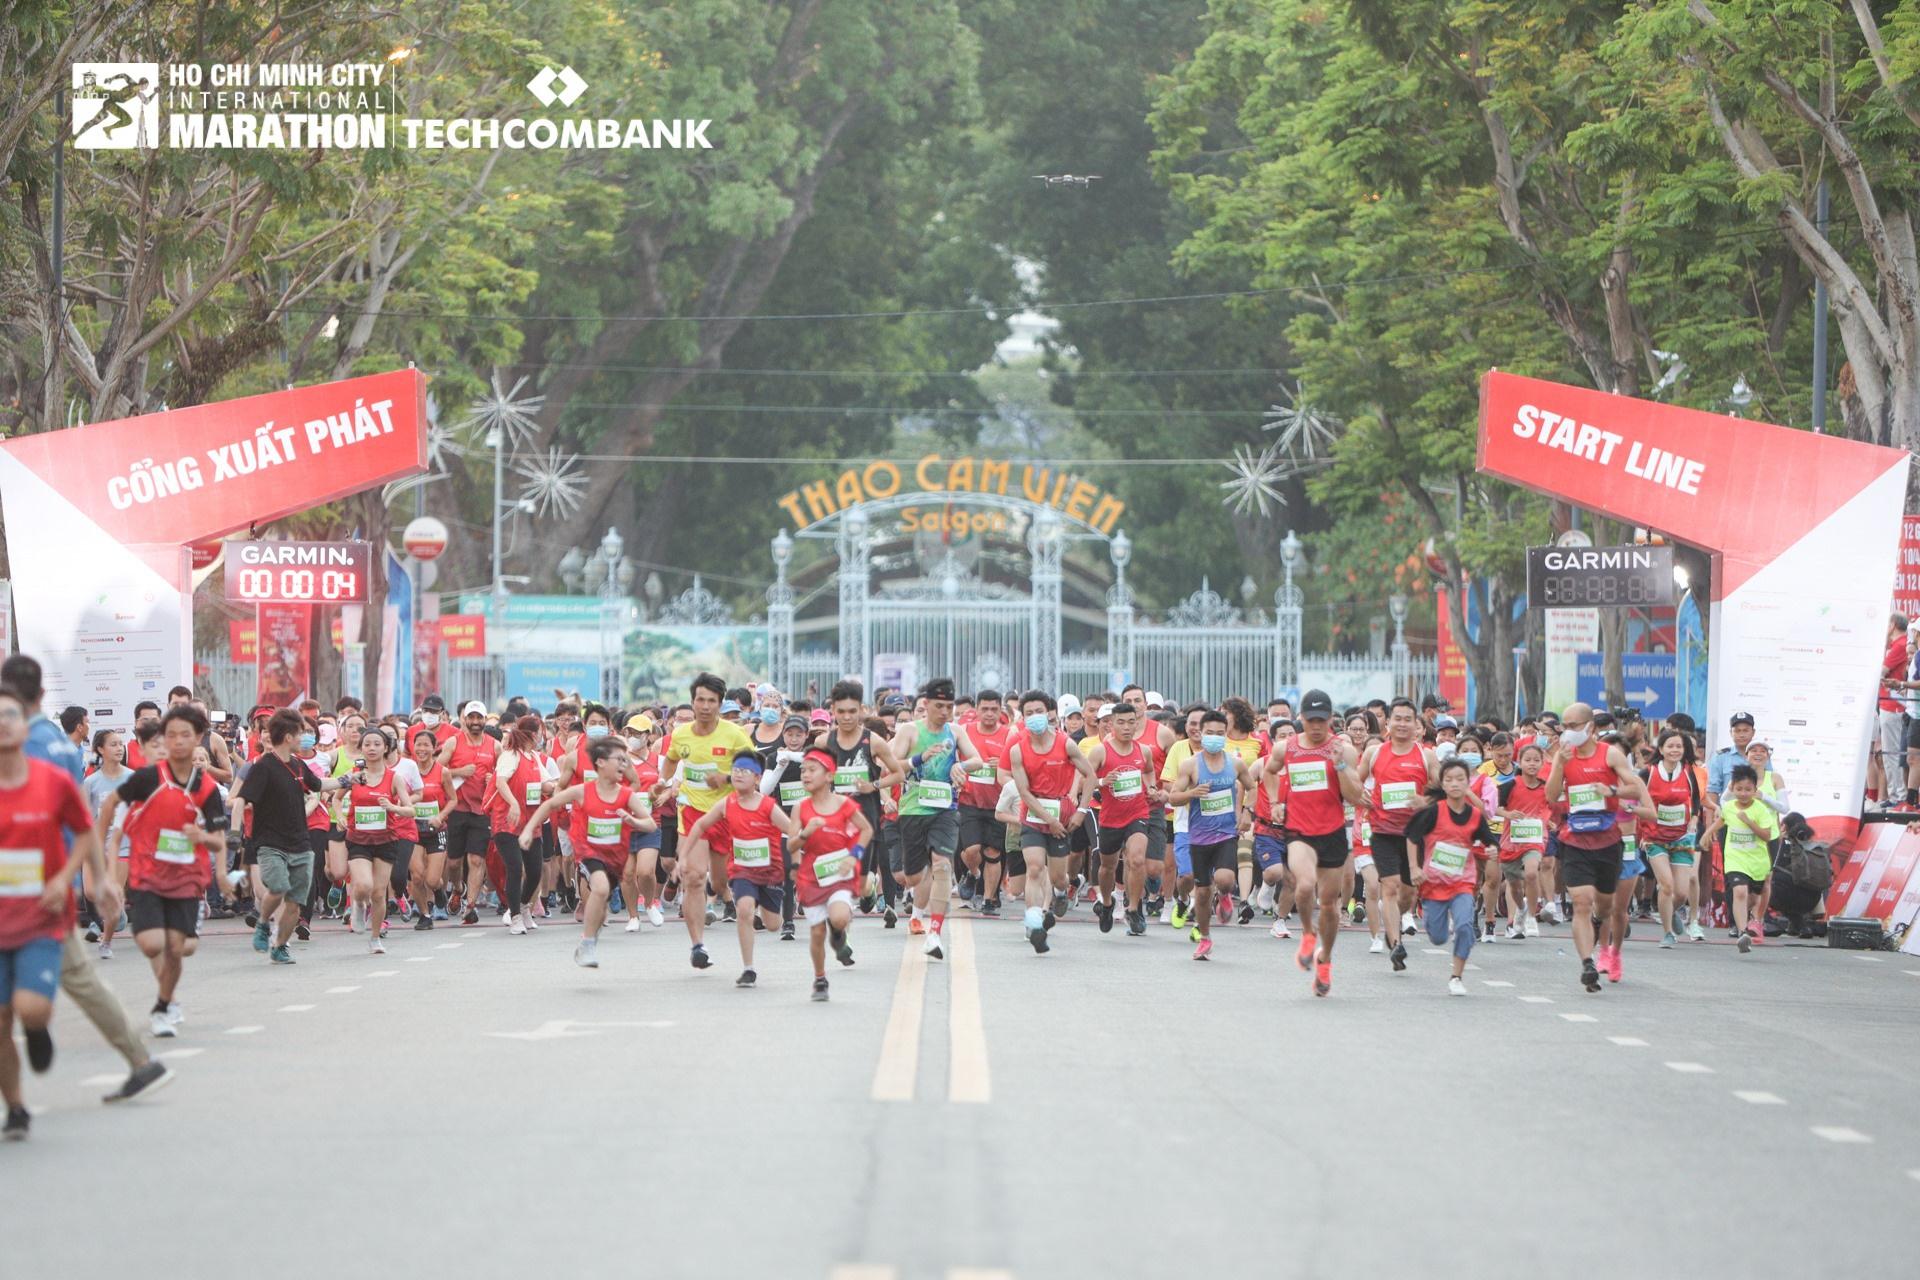 Gian lận tinh vi tại giải marathon ở TP.HCM? - Ảnh 1.